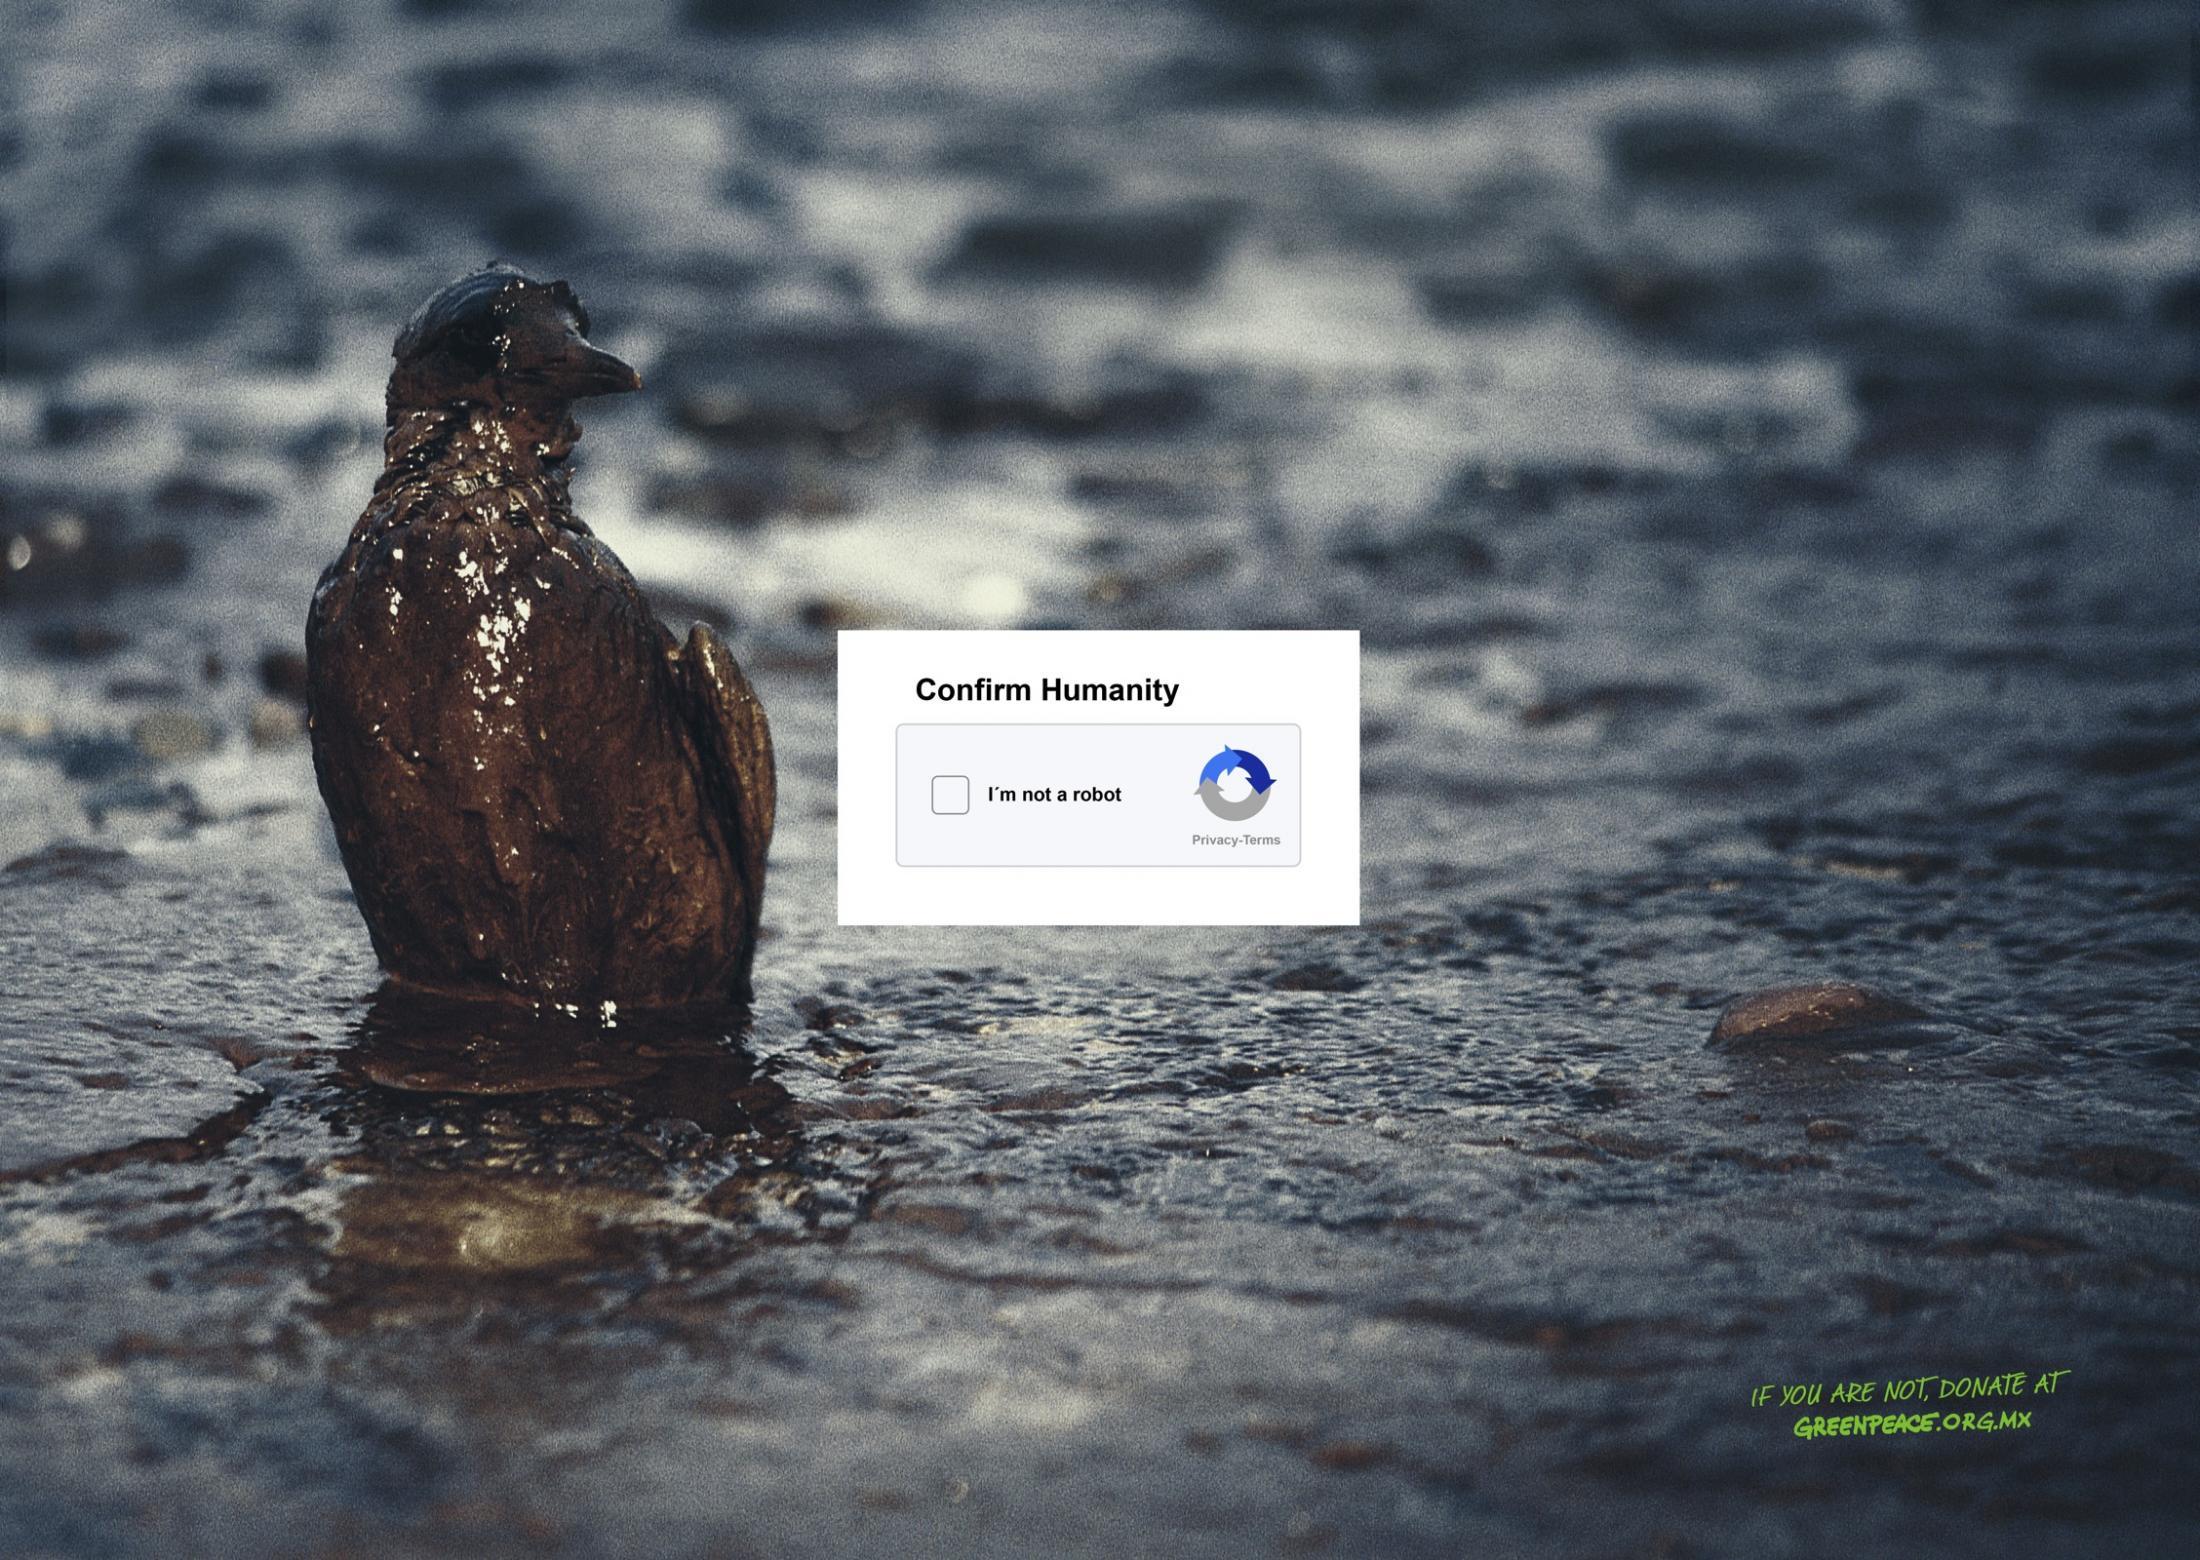 Greenpeace Print Ad - Humanity, 2